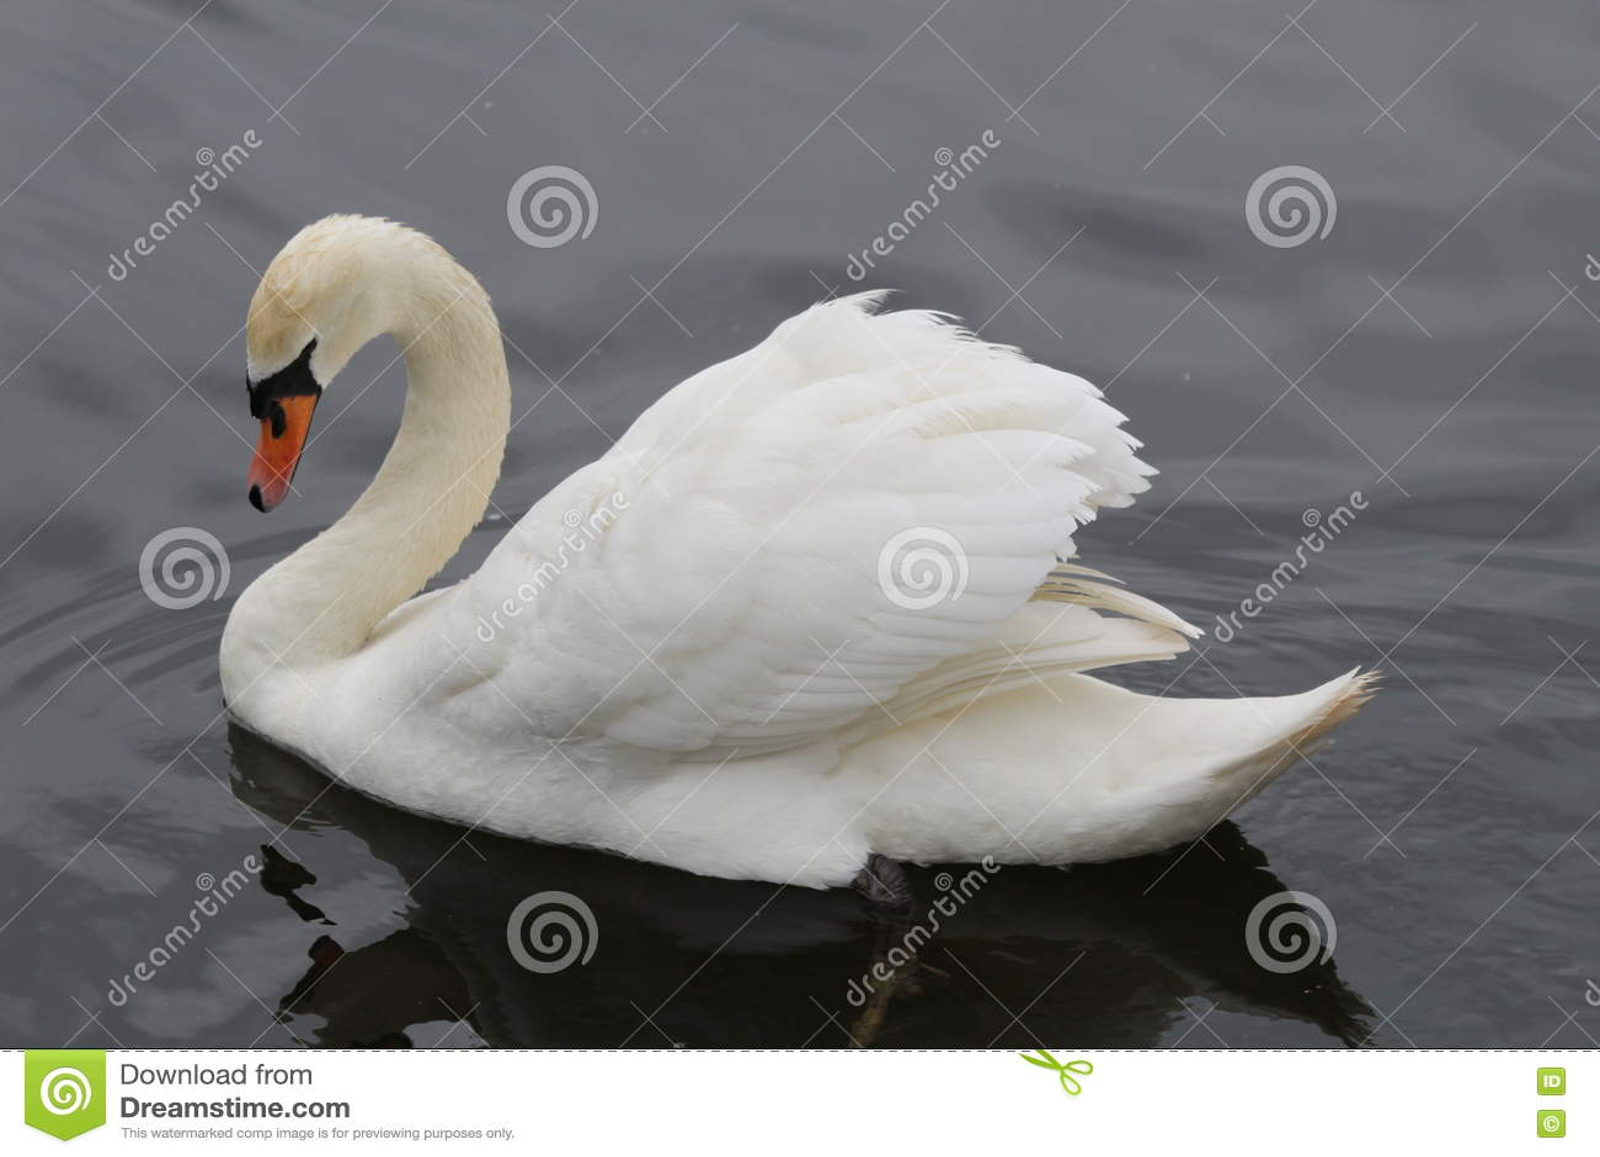 Majestic Mute Swan